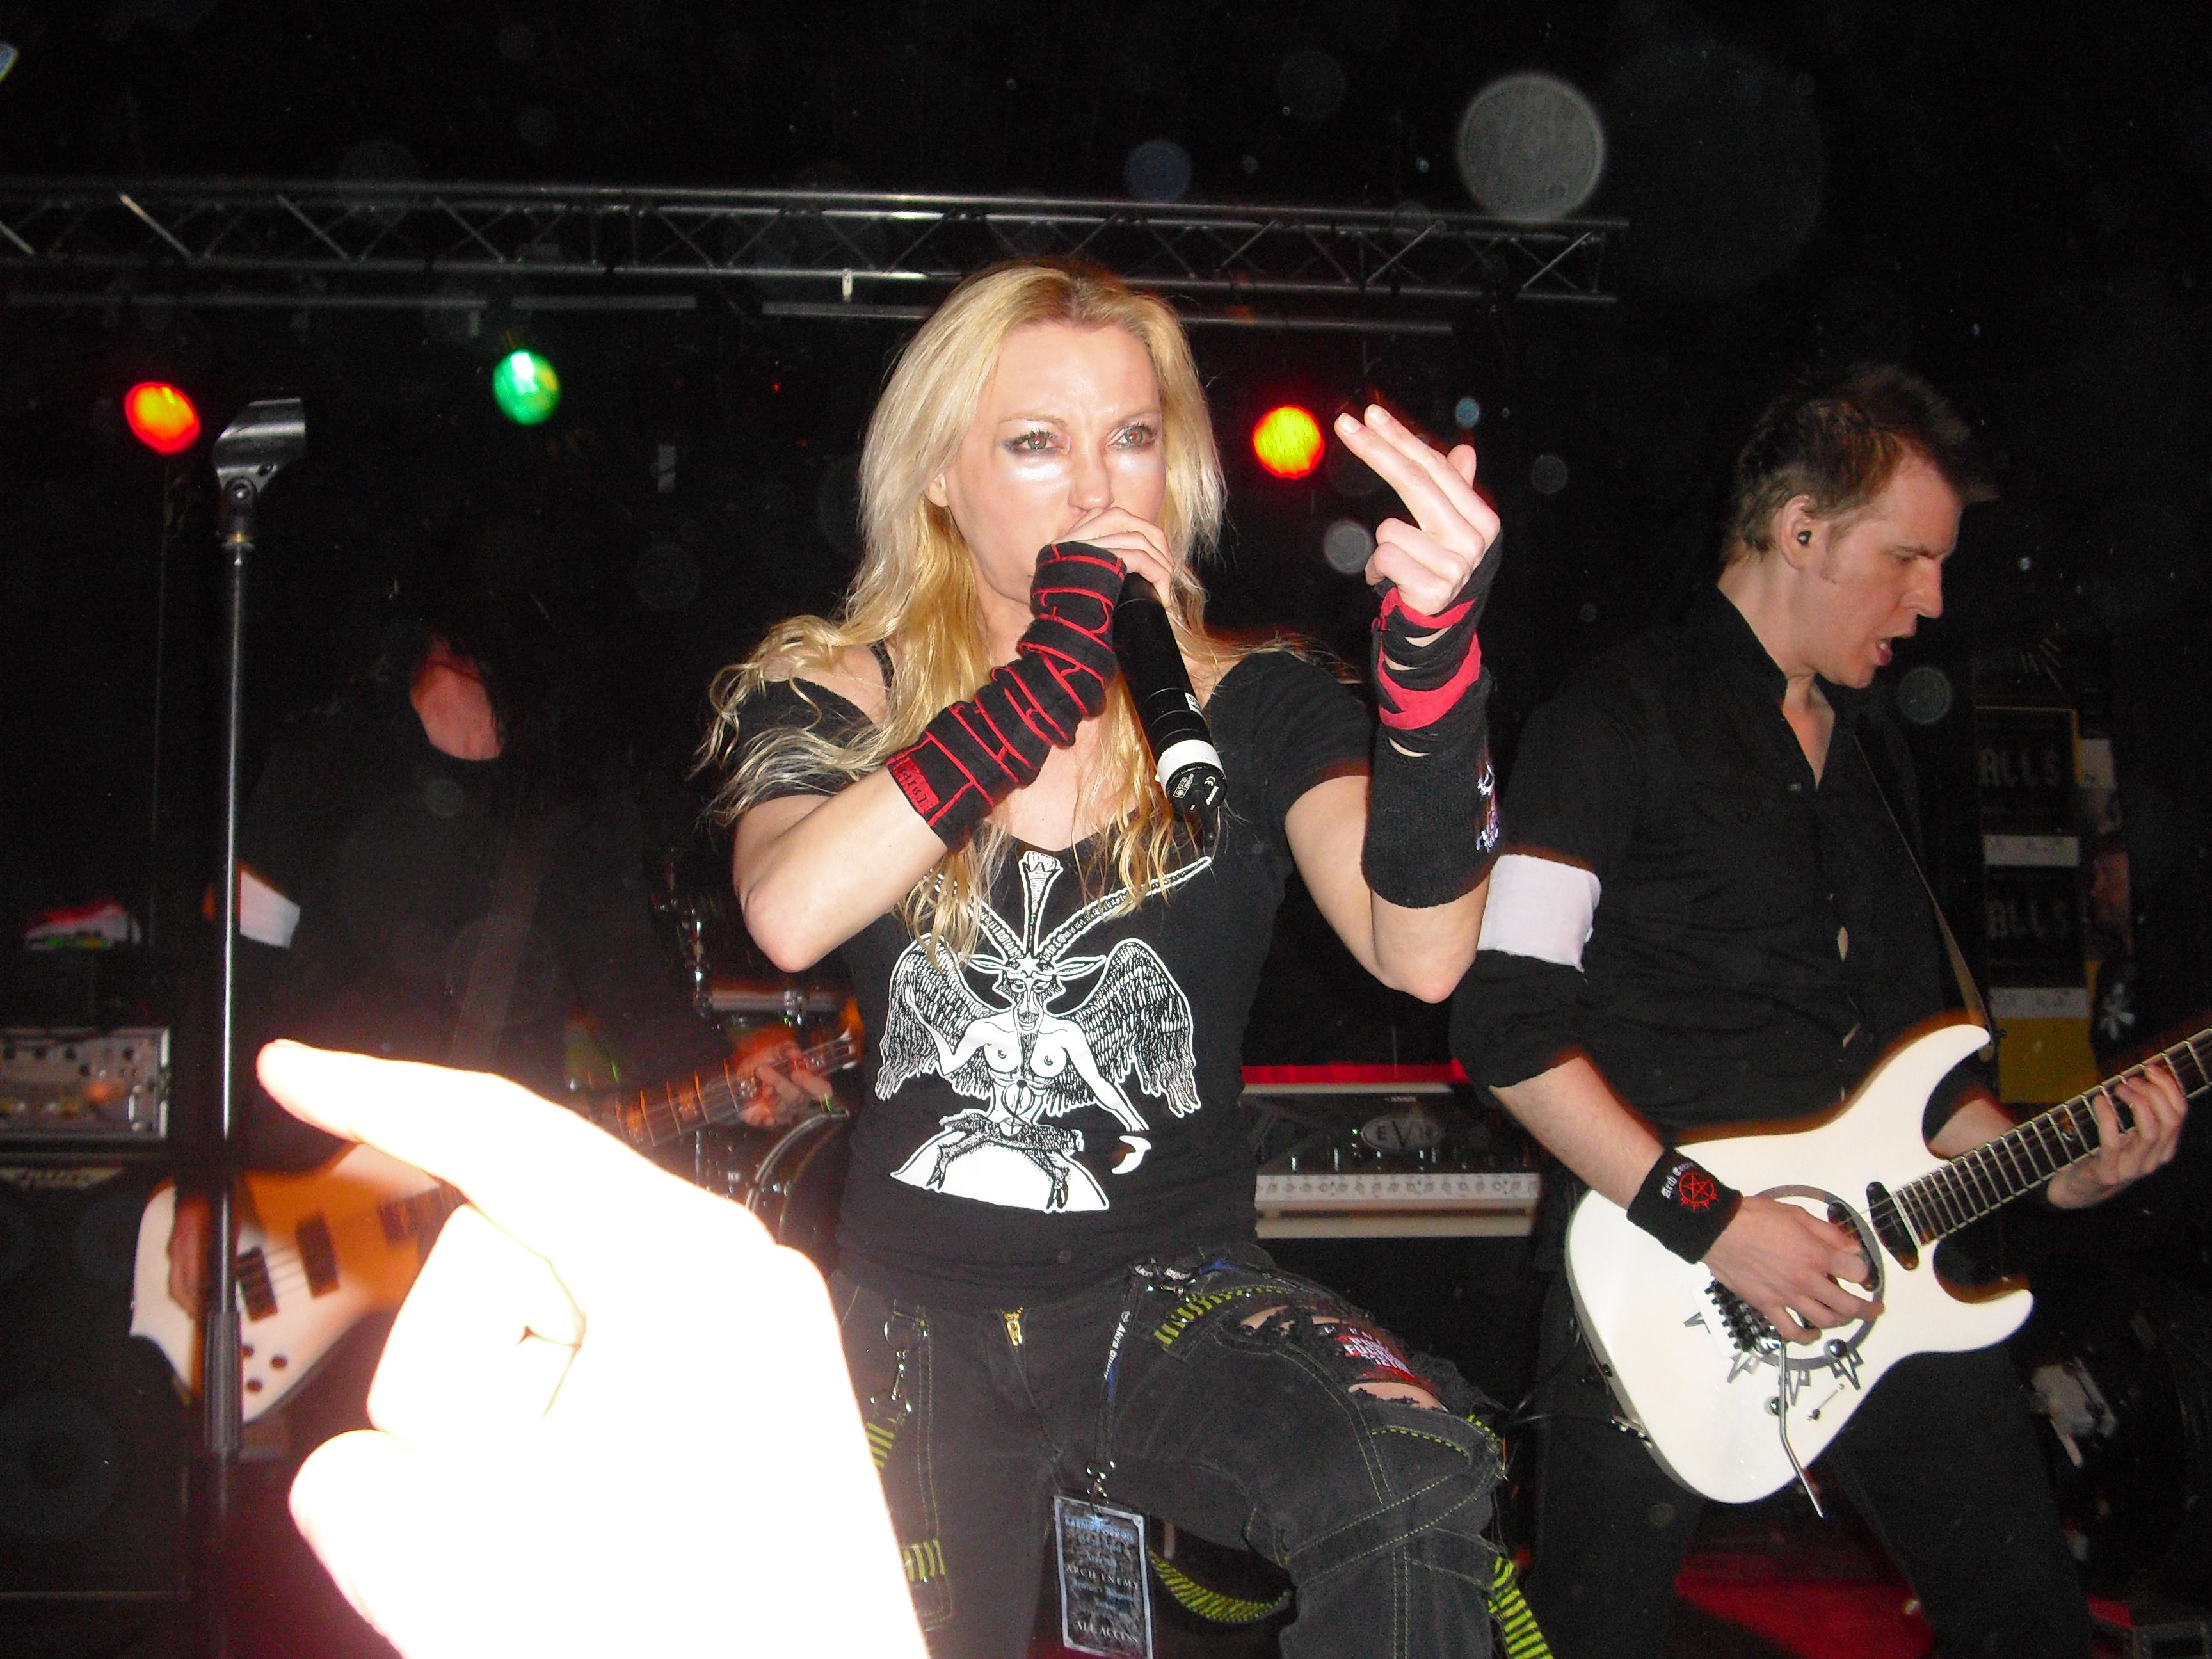 File:Angela Gossow-Arch Enemy Untouchables Hard Rock Club Jevnaker.jpg